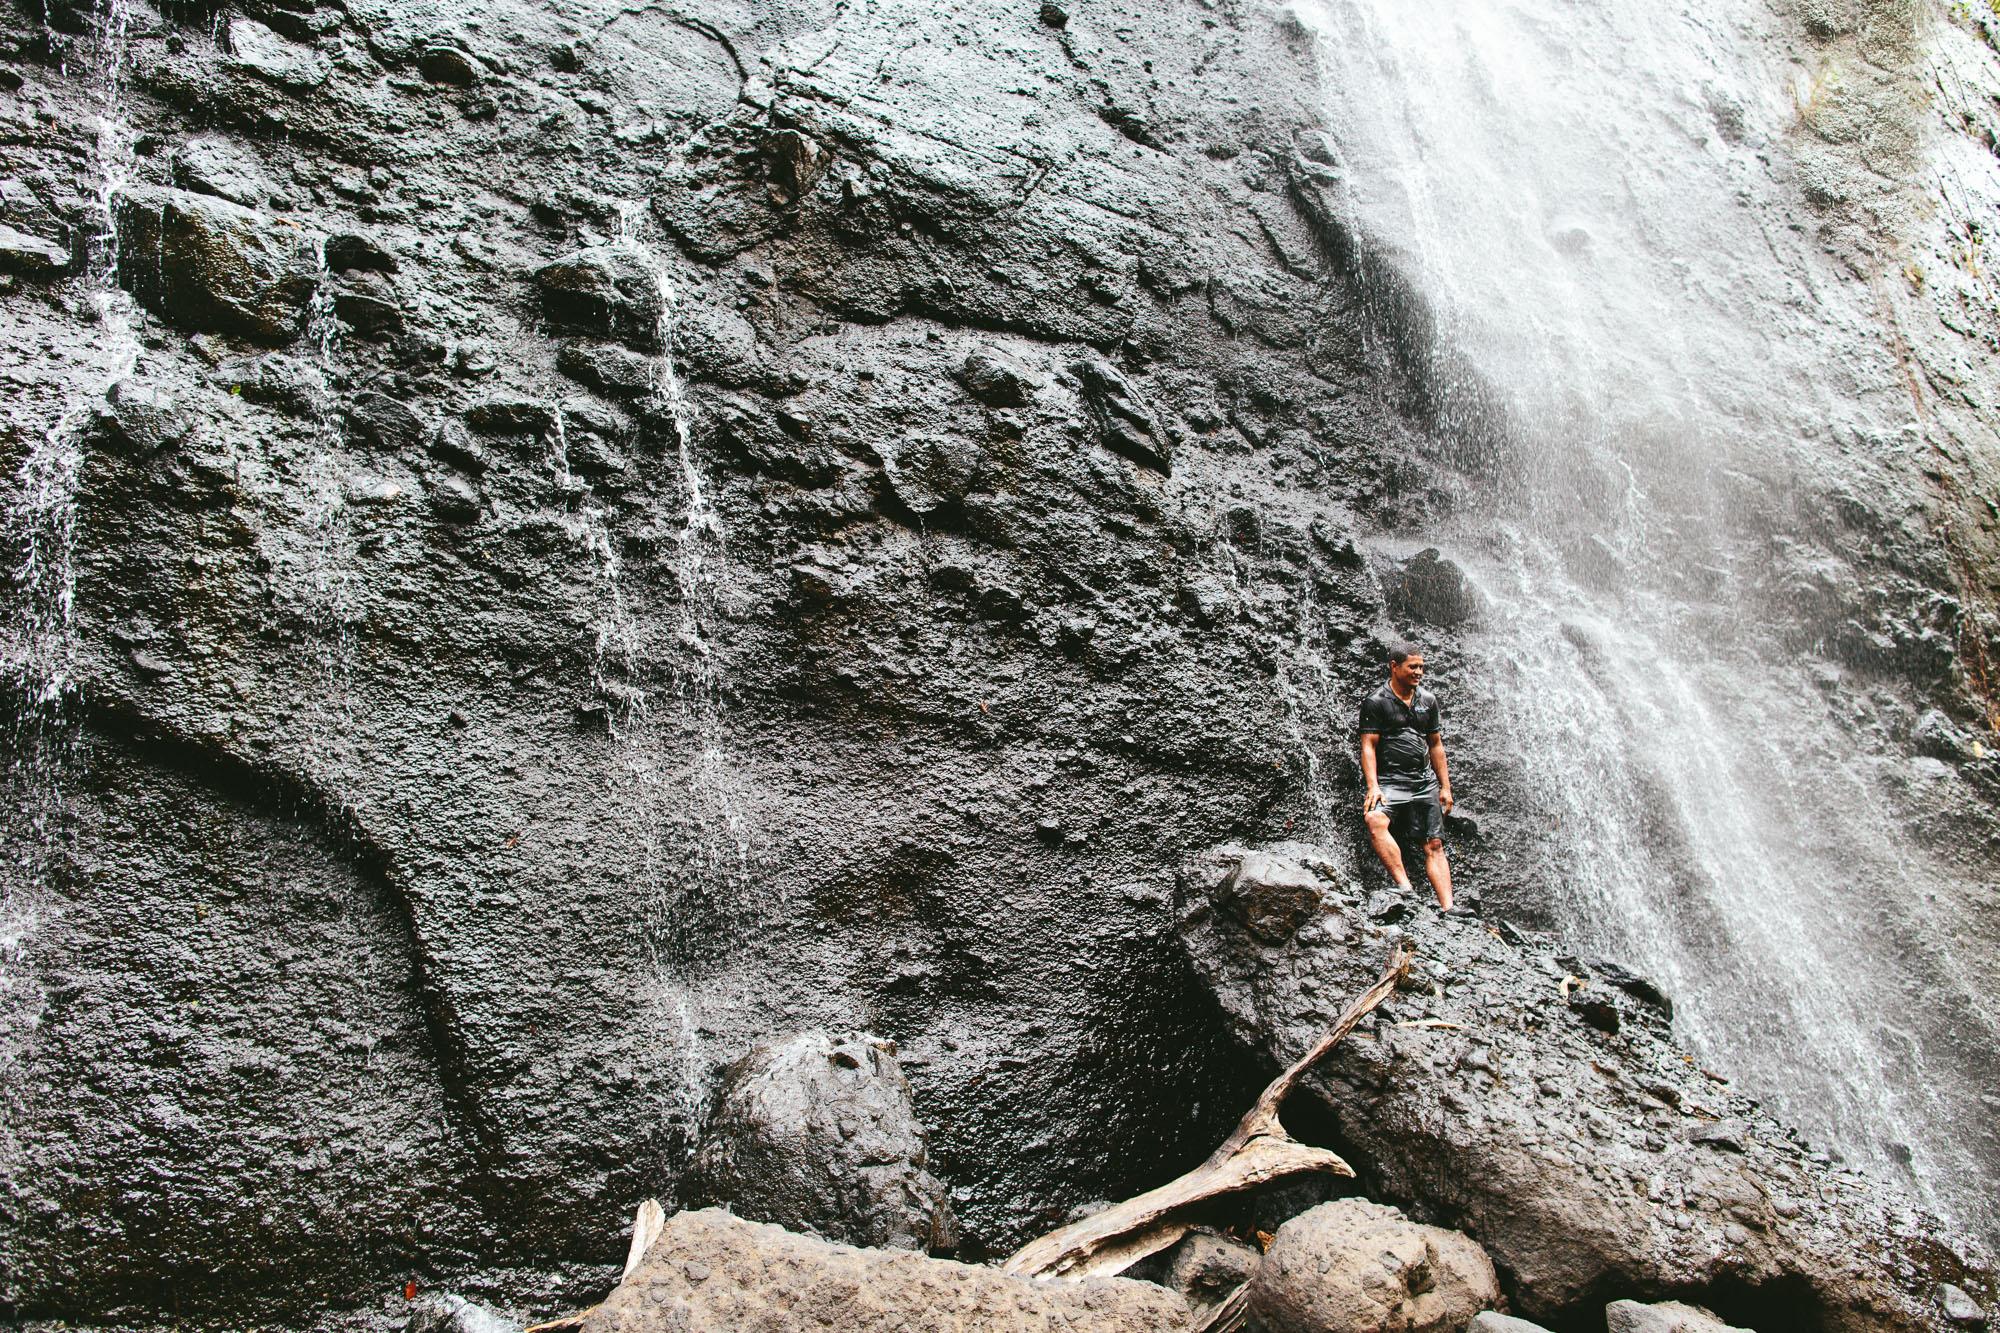 Buca Waterfall Hike - Vanua Levu - The Remote Resort, Fiji Islands